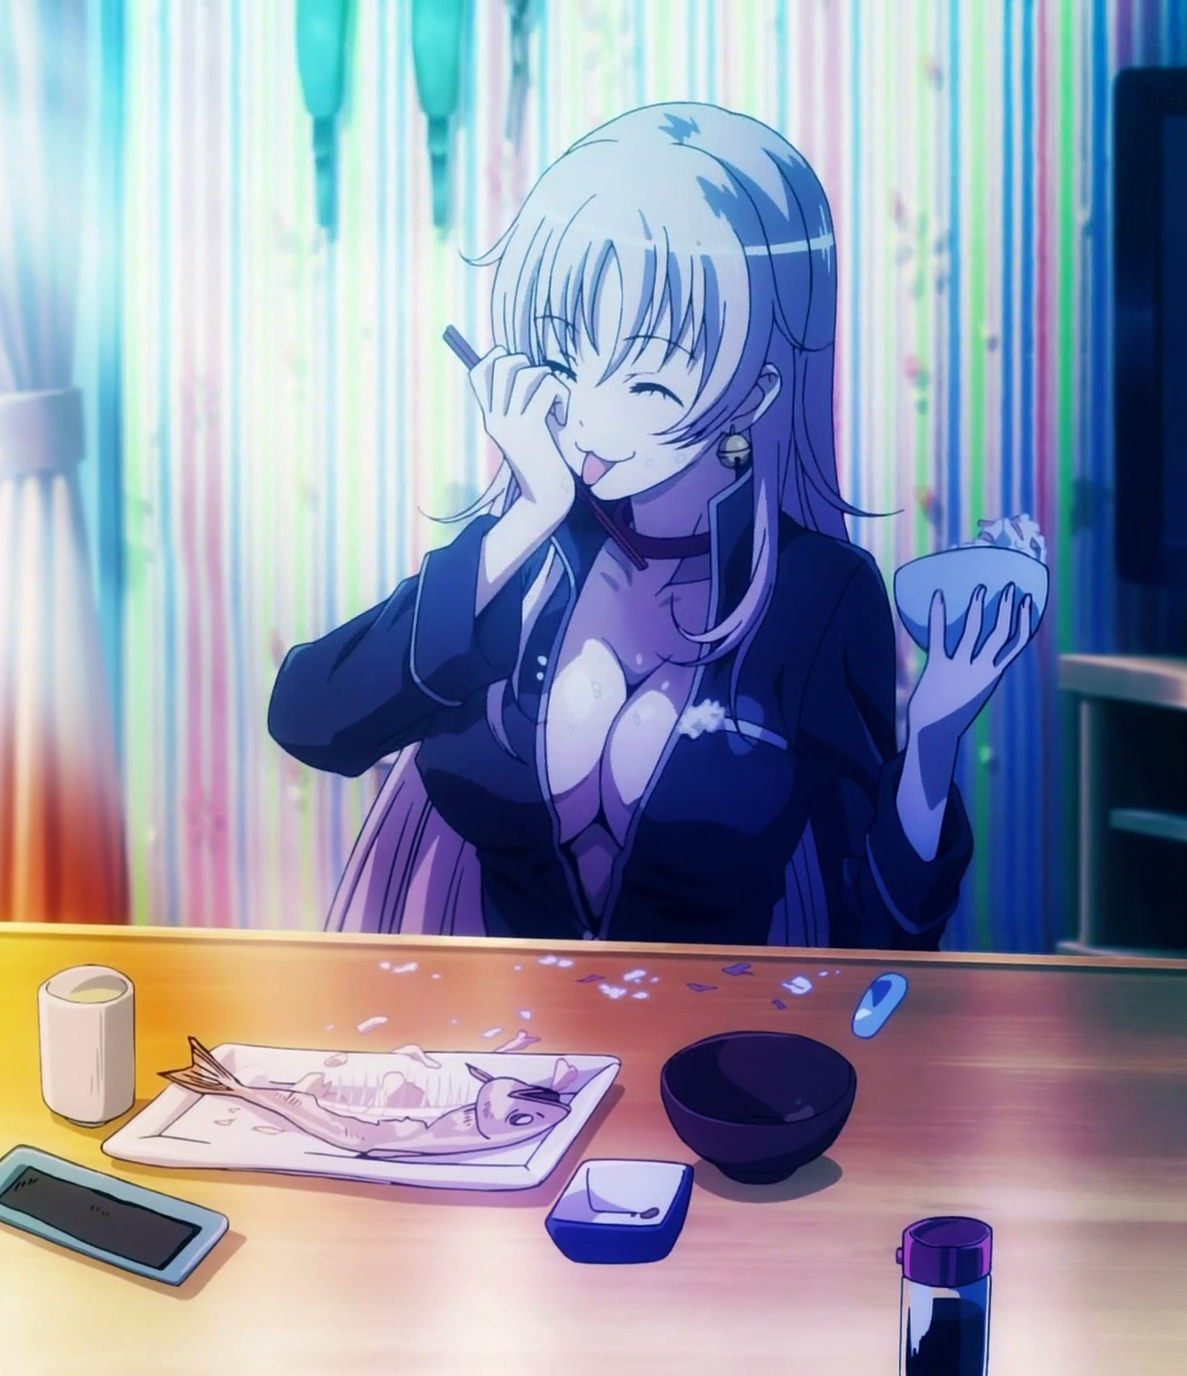 K Anime Characters Neko : Image neko eating k project wiki fandom powered